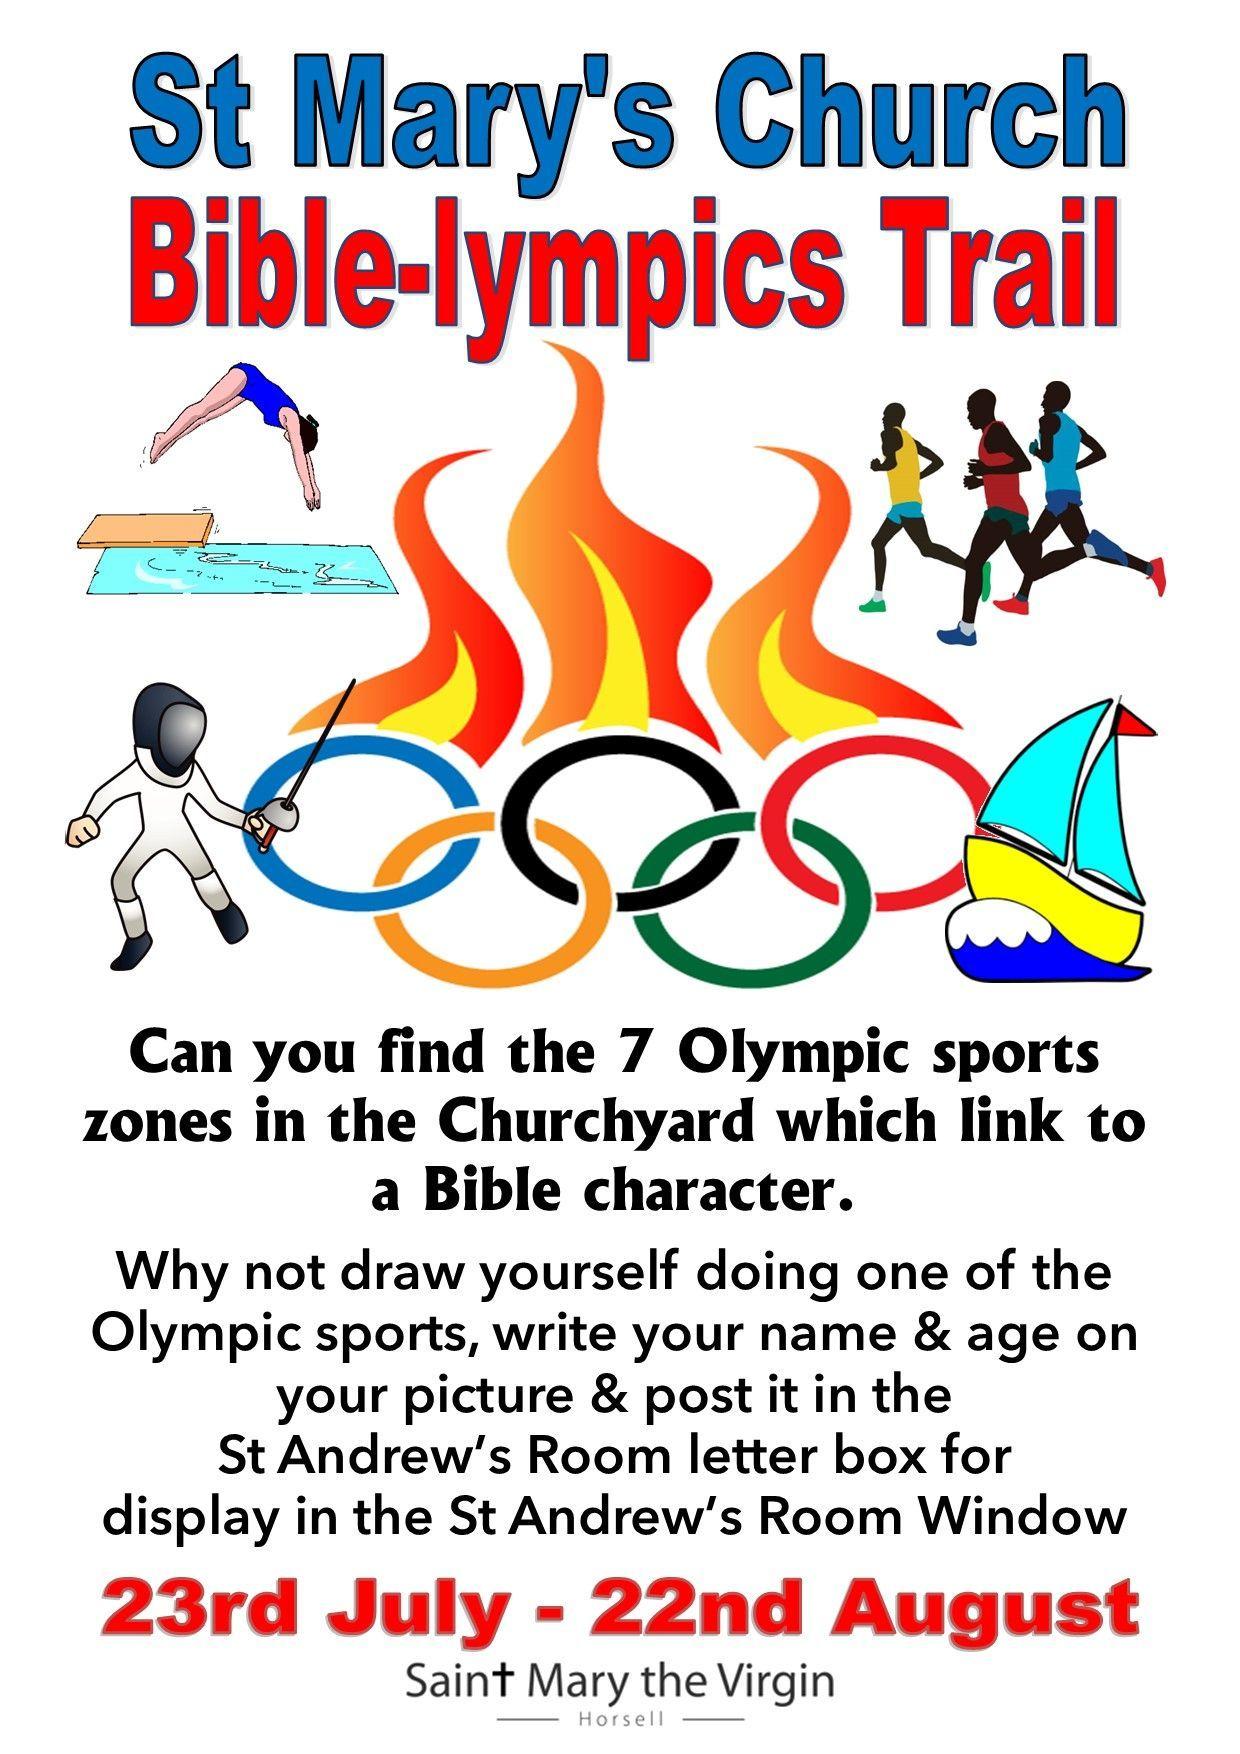 Bible-lympics trail